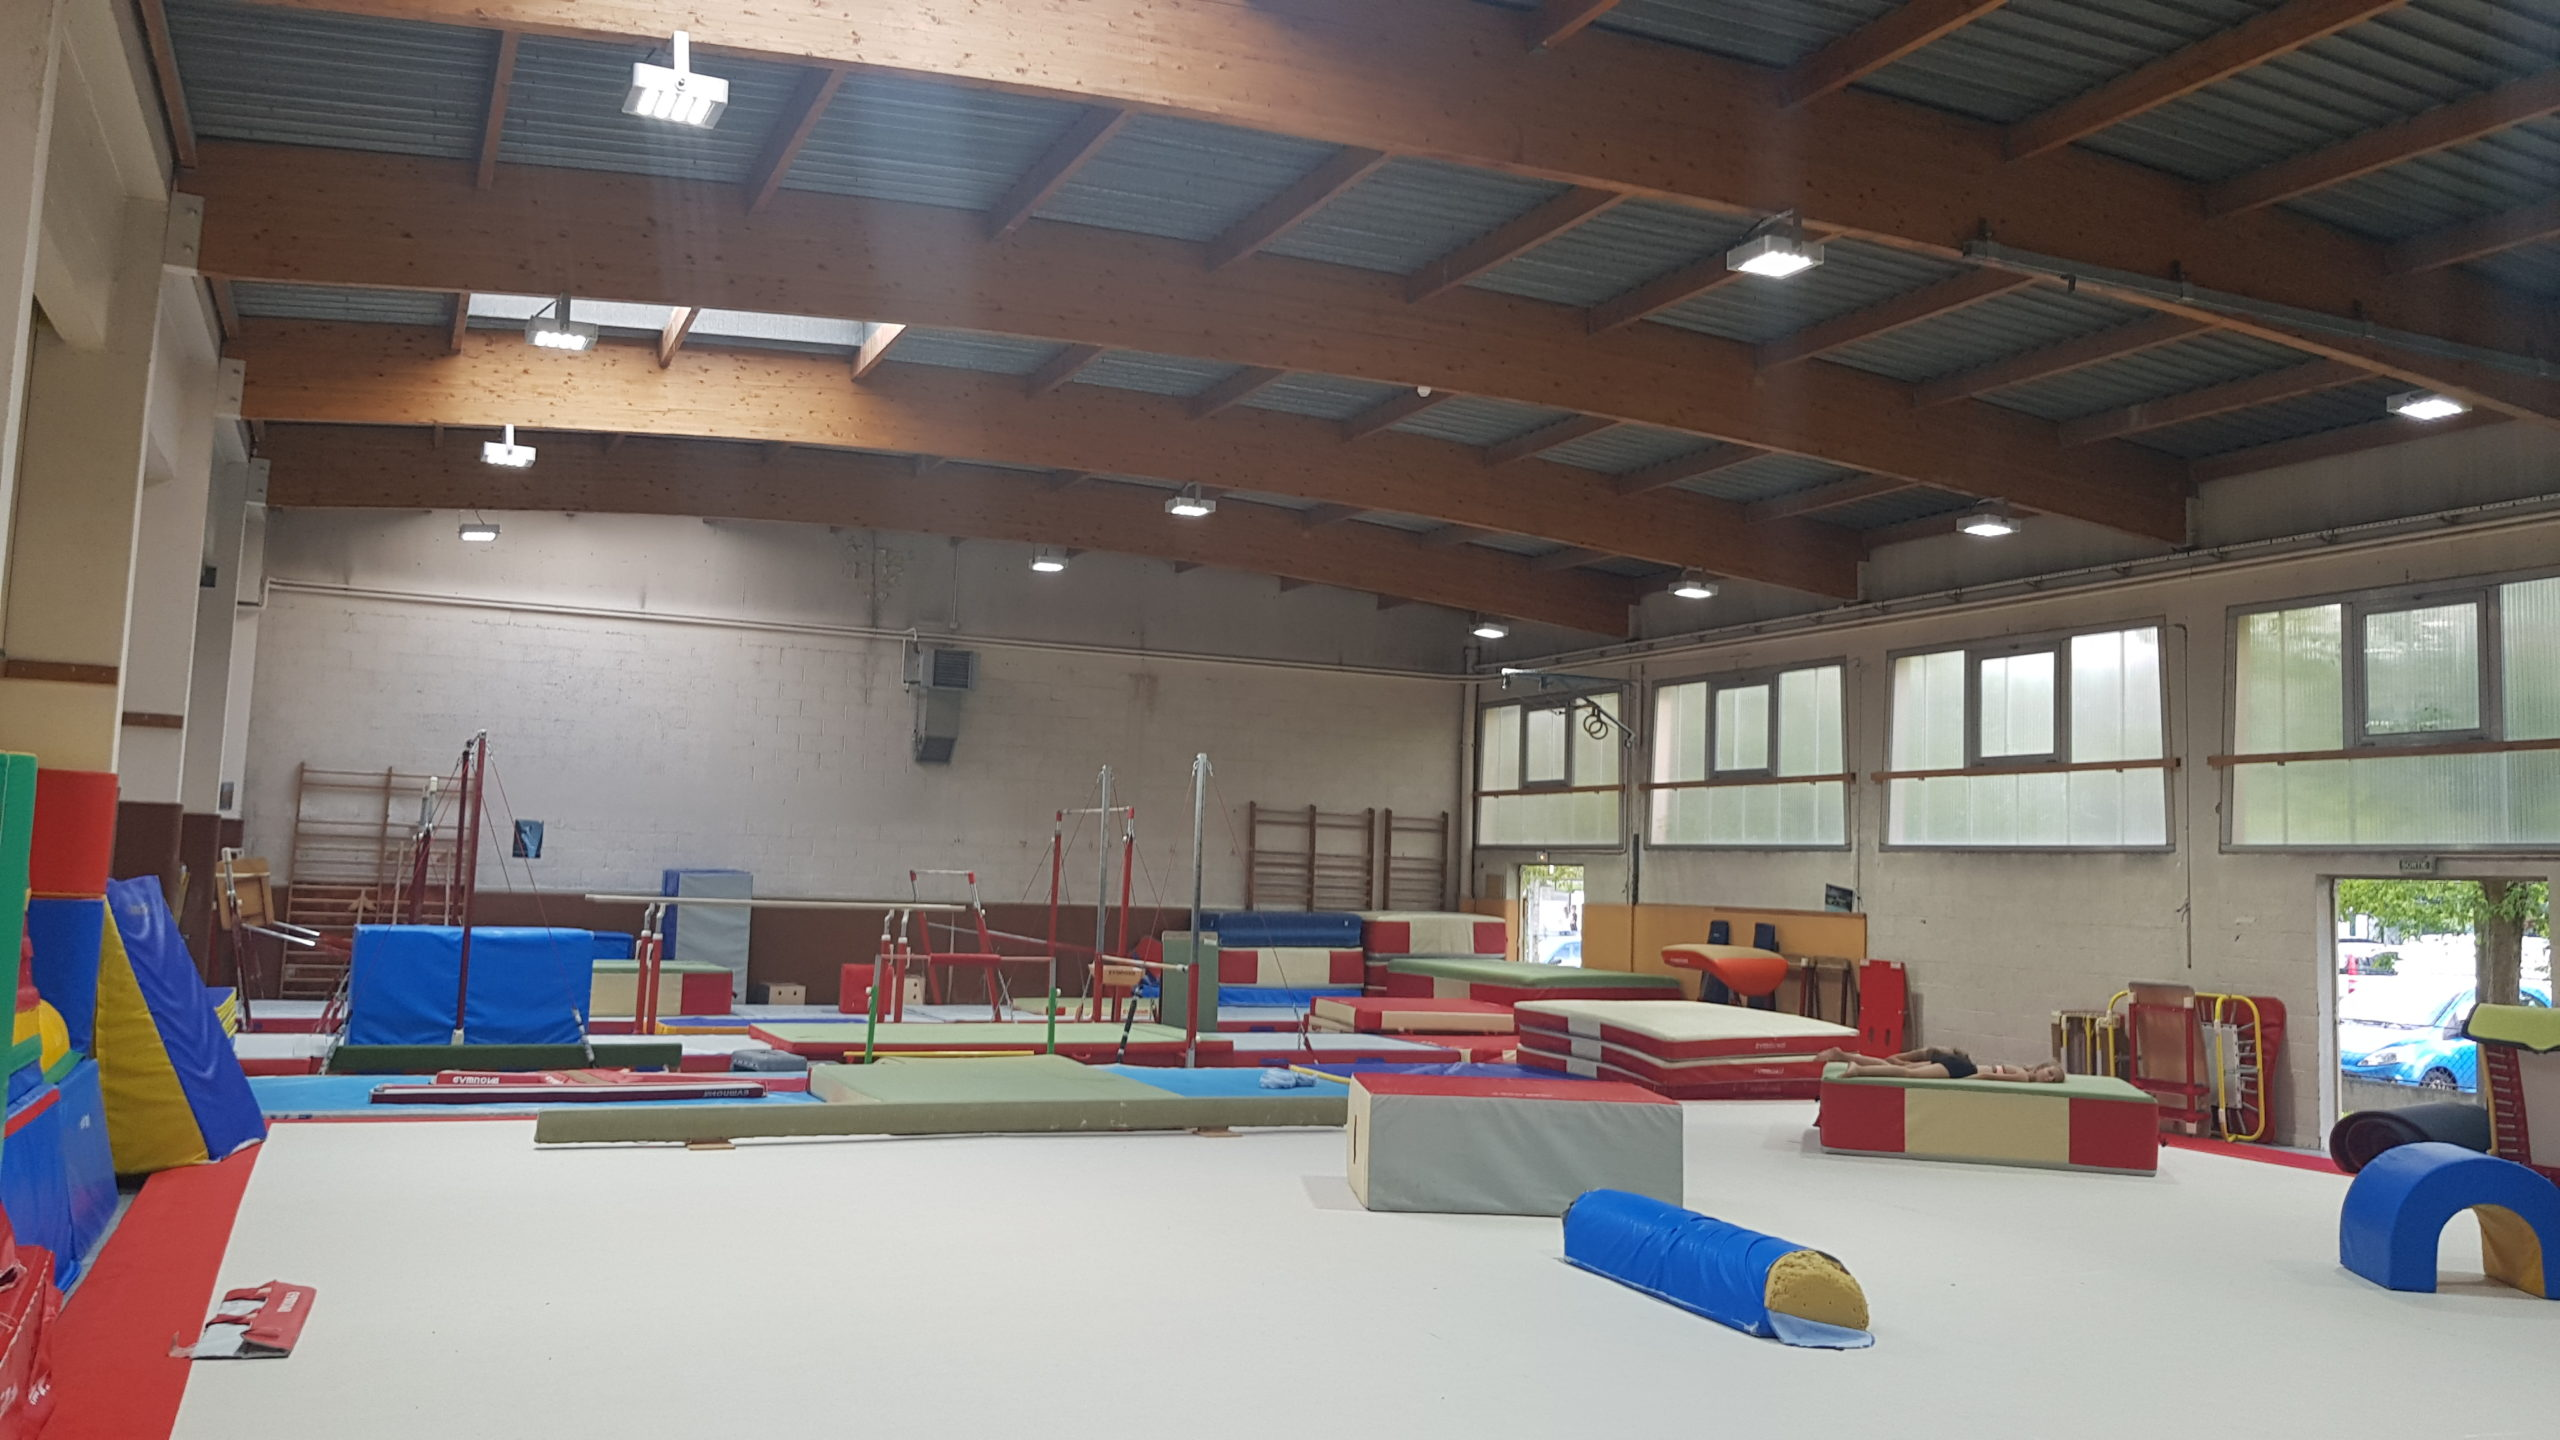 Gymnases de Longjumeau